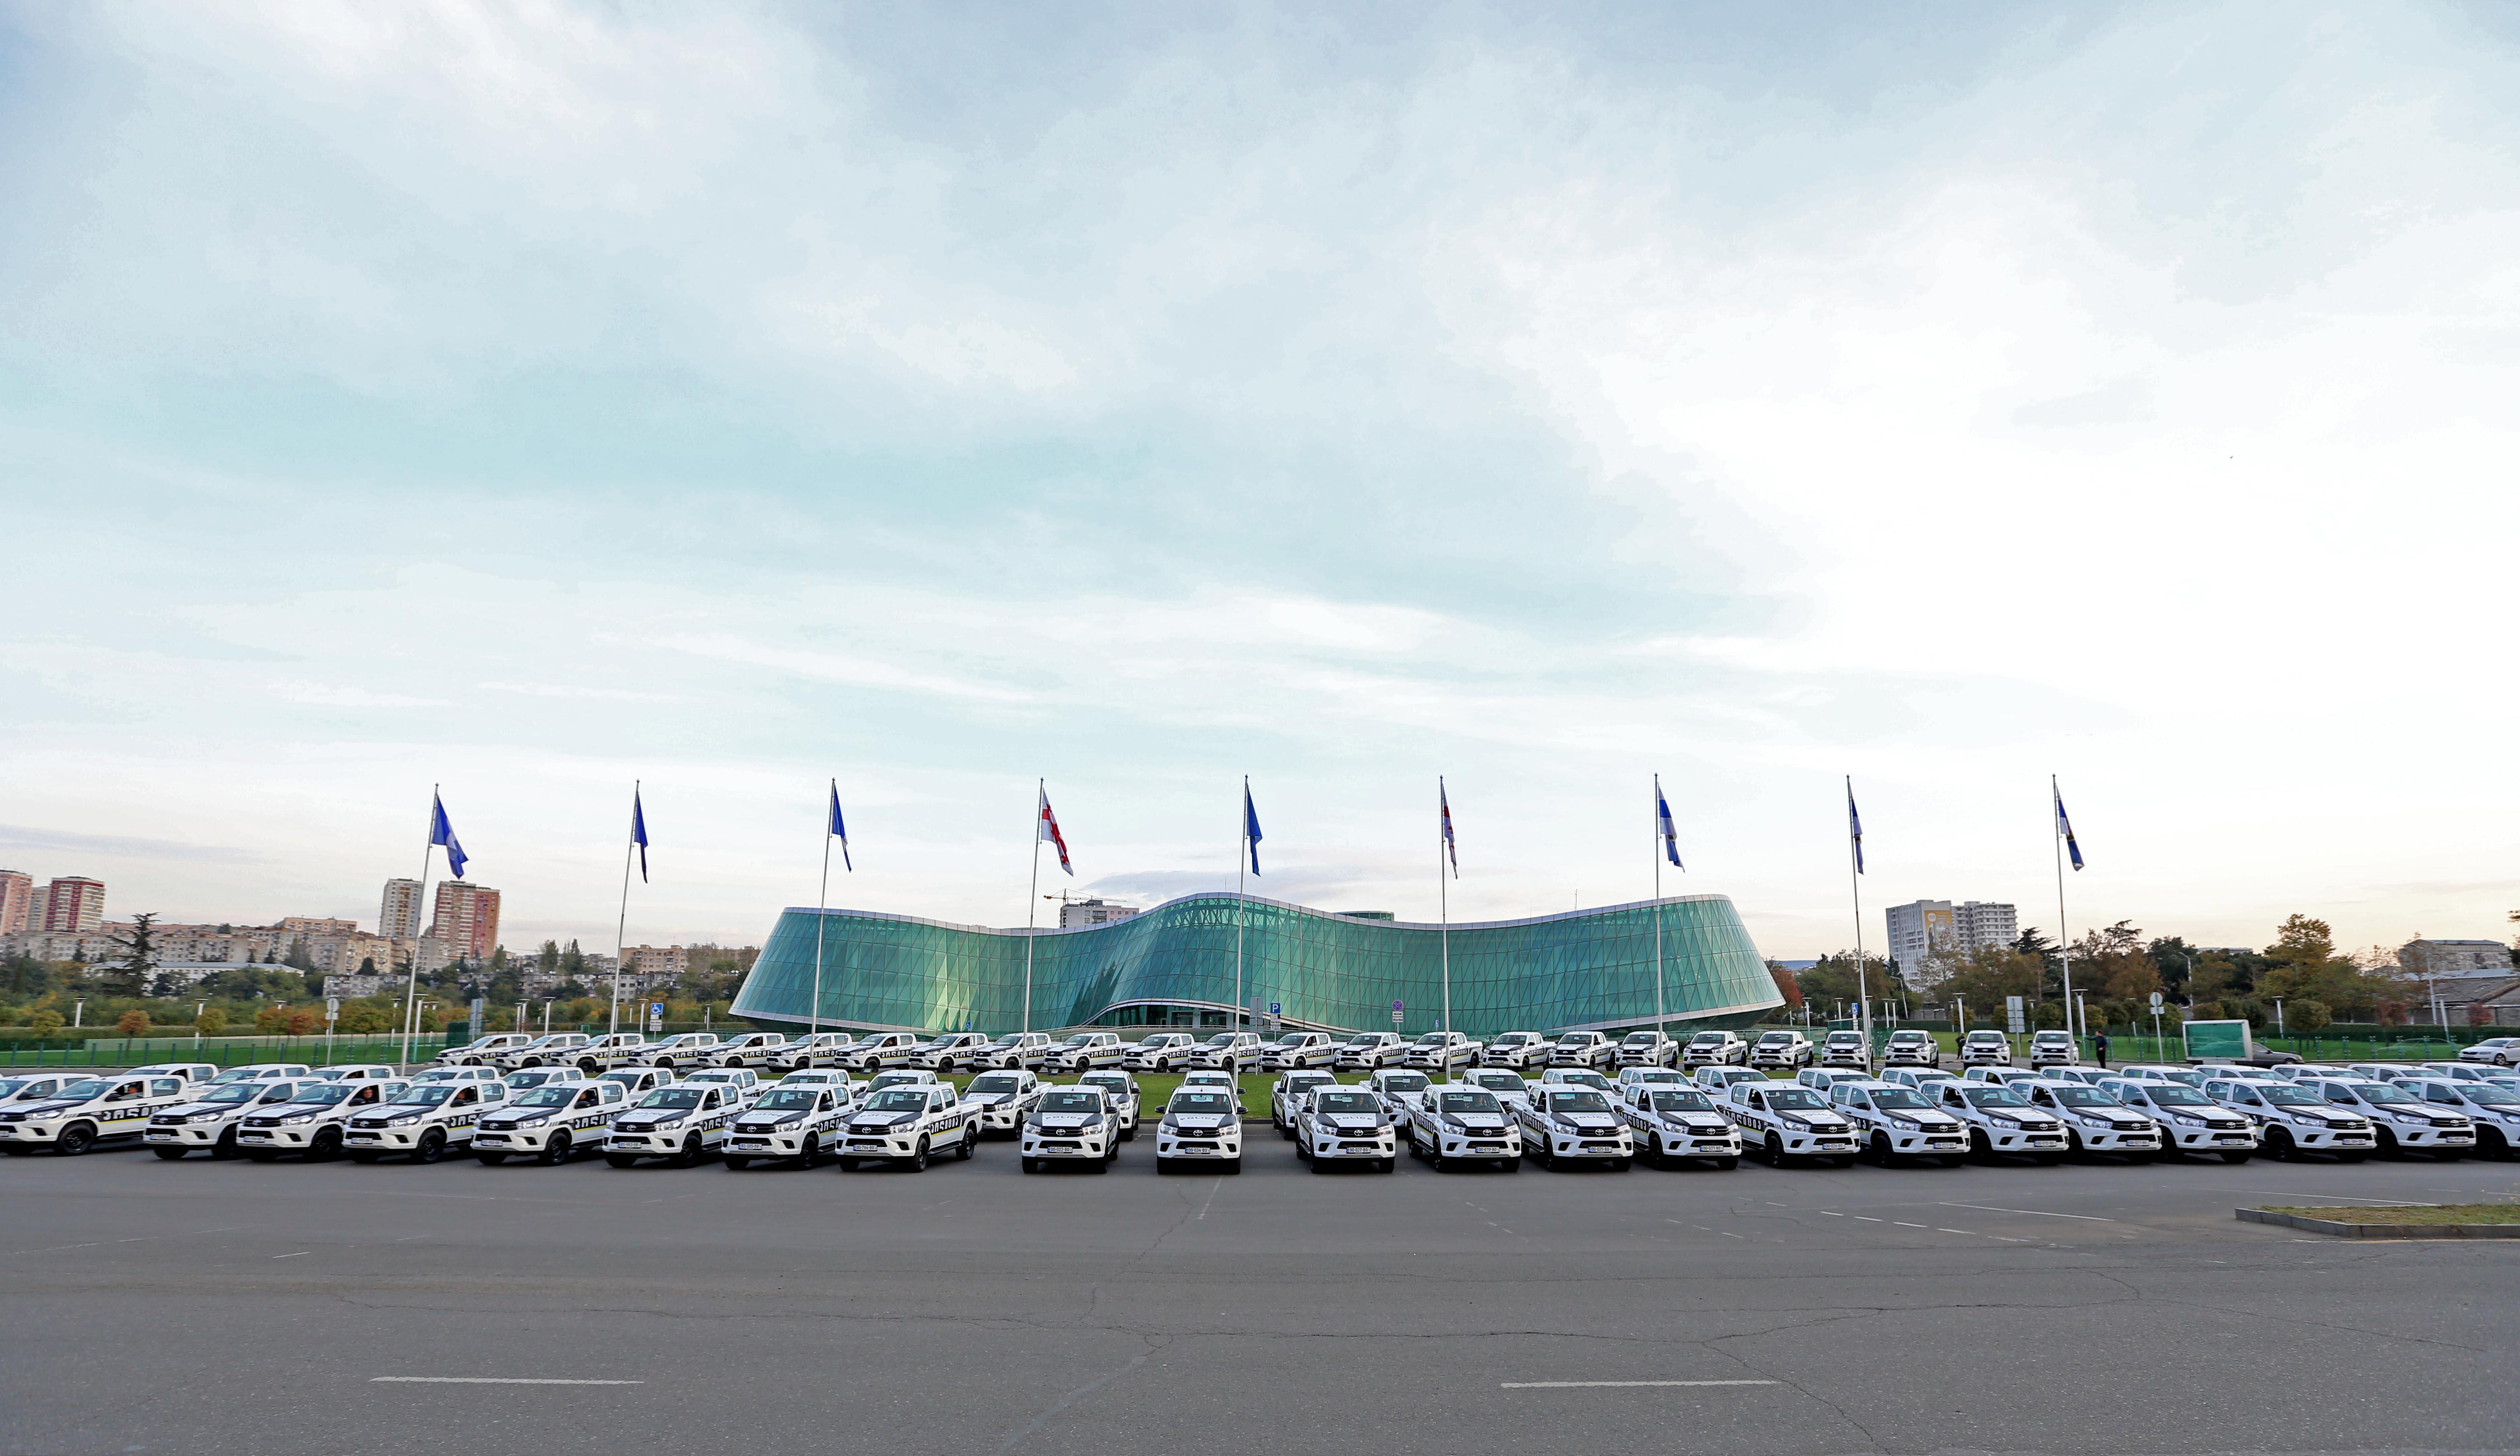 Police 5 #новости PHR, МВД Грузии, Ниноцминда, пансионат Ниноцминда